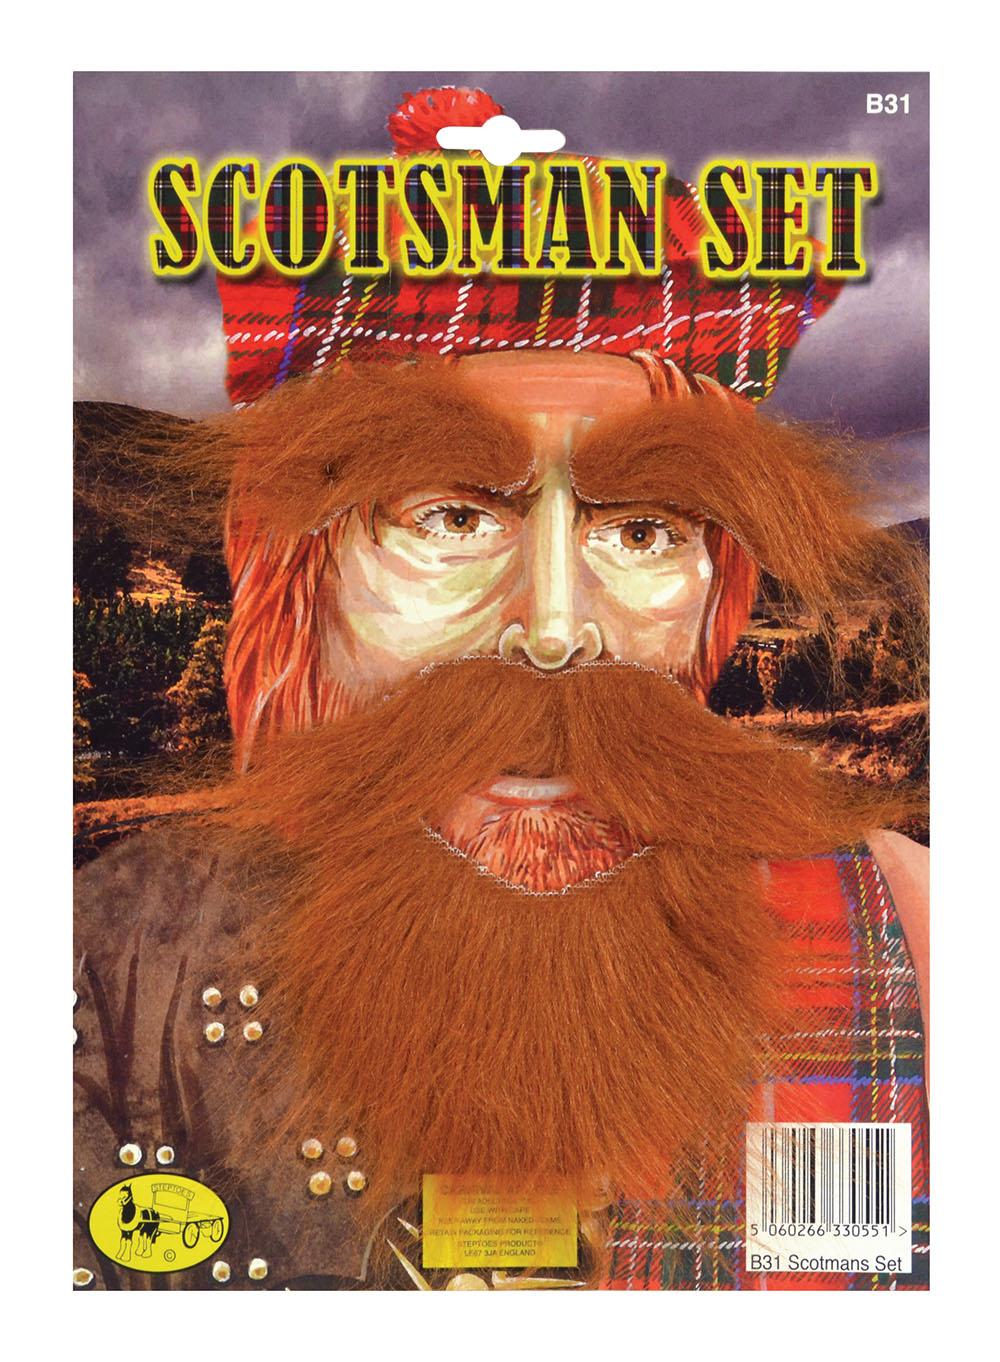 Scotsman Set, Ginger fake Moustache Beard Eyebrows